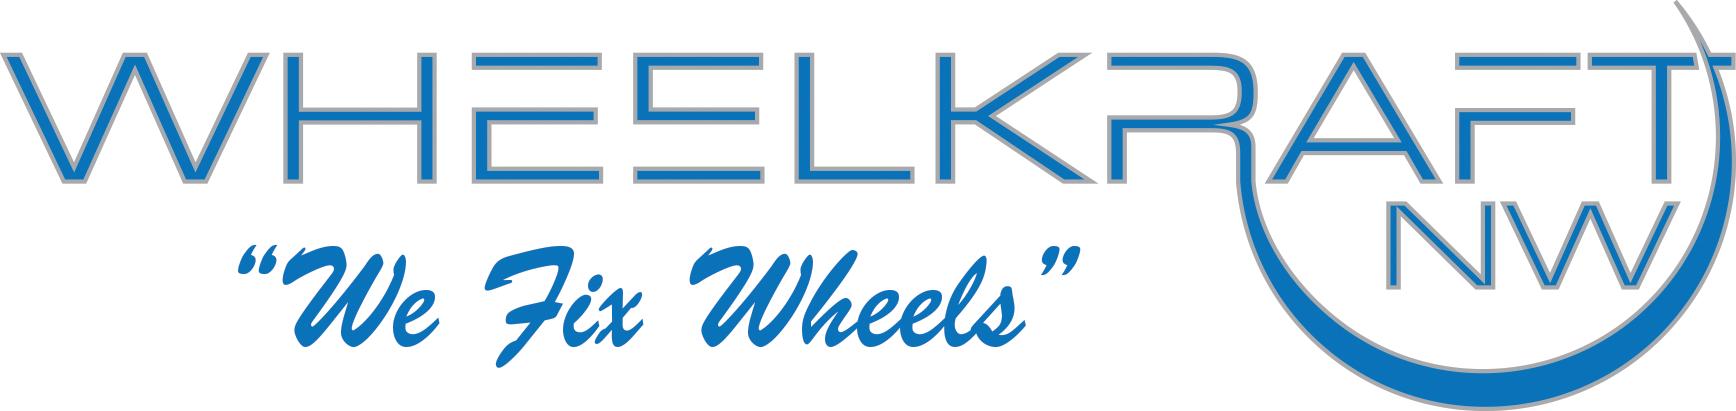 logo_WheelkraftNW.png